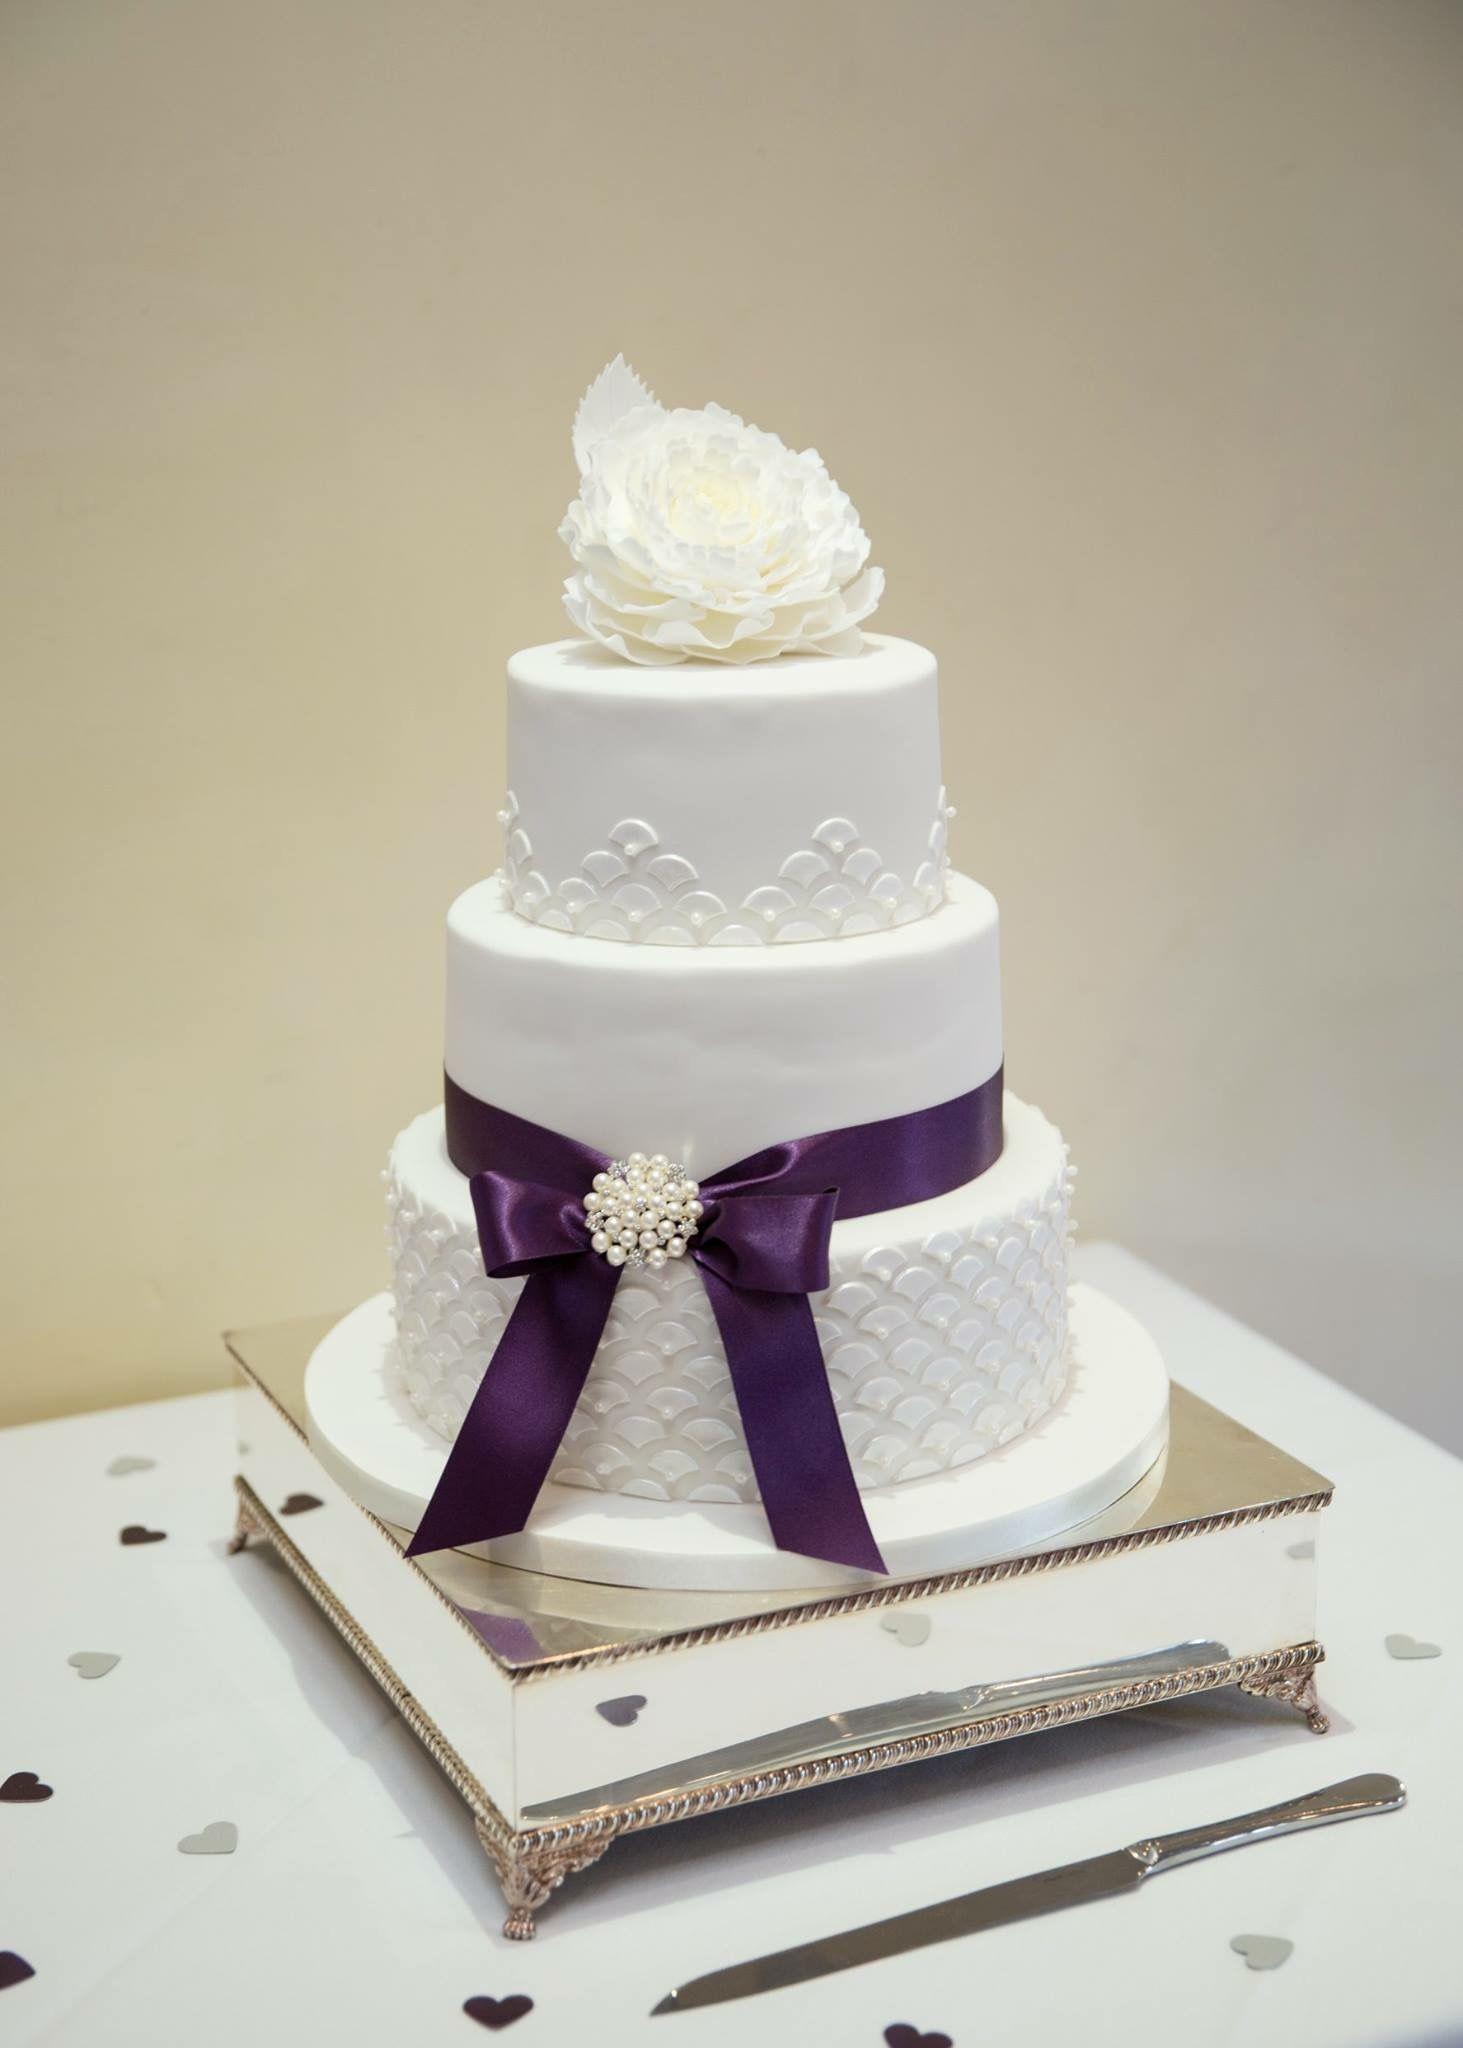 Art Deco themed wedding cake #weddingcake #wedding #cake #artdeco ...